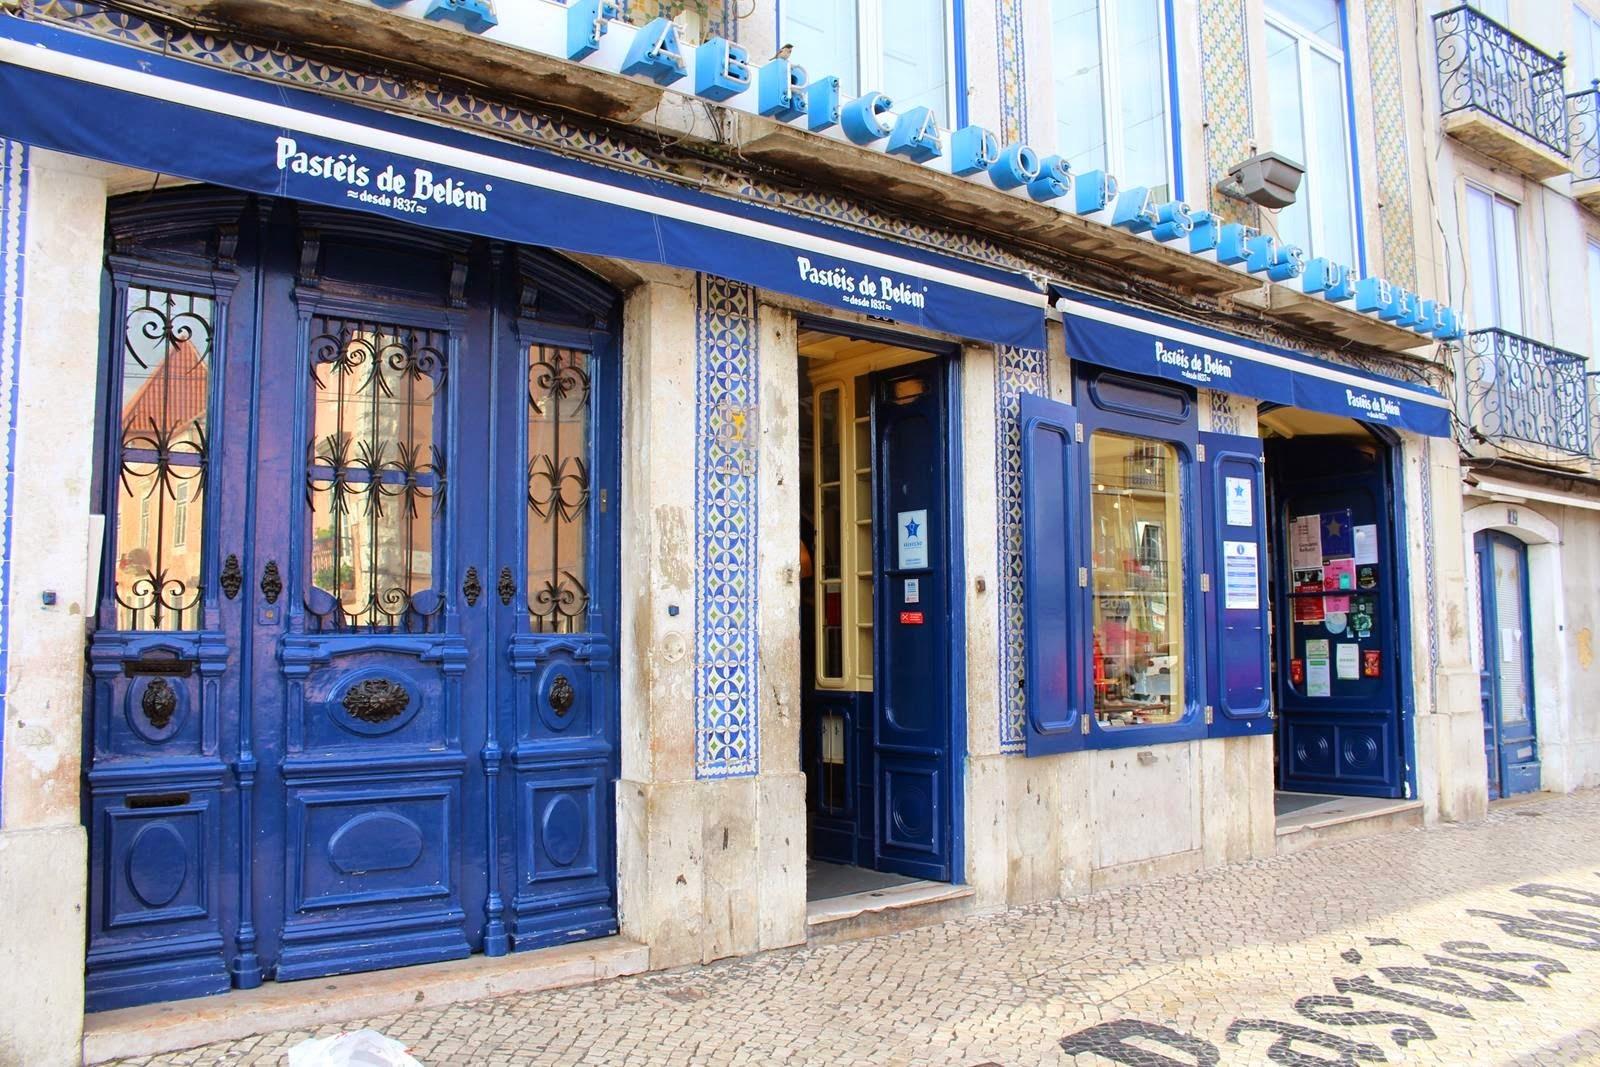 Pasteis de Belem store - Lisbon